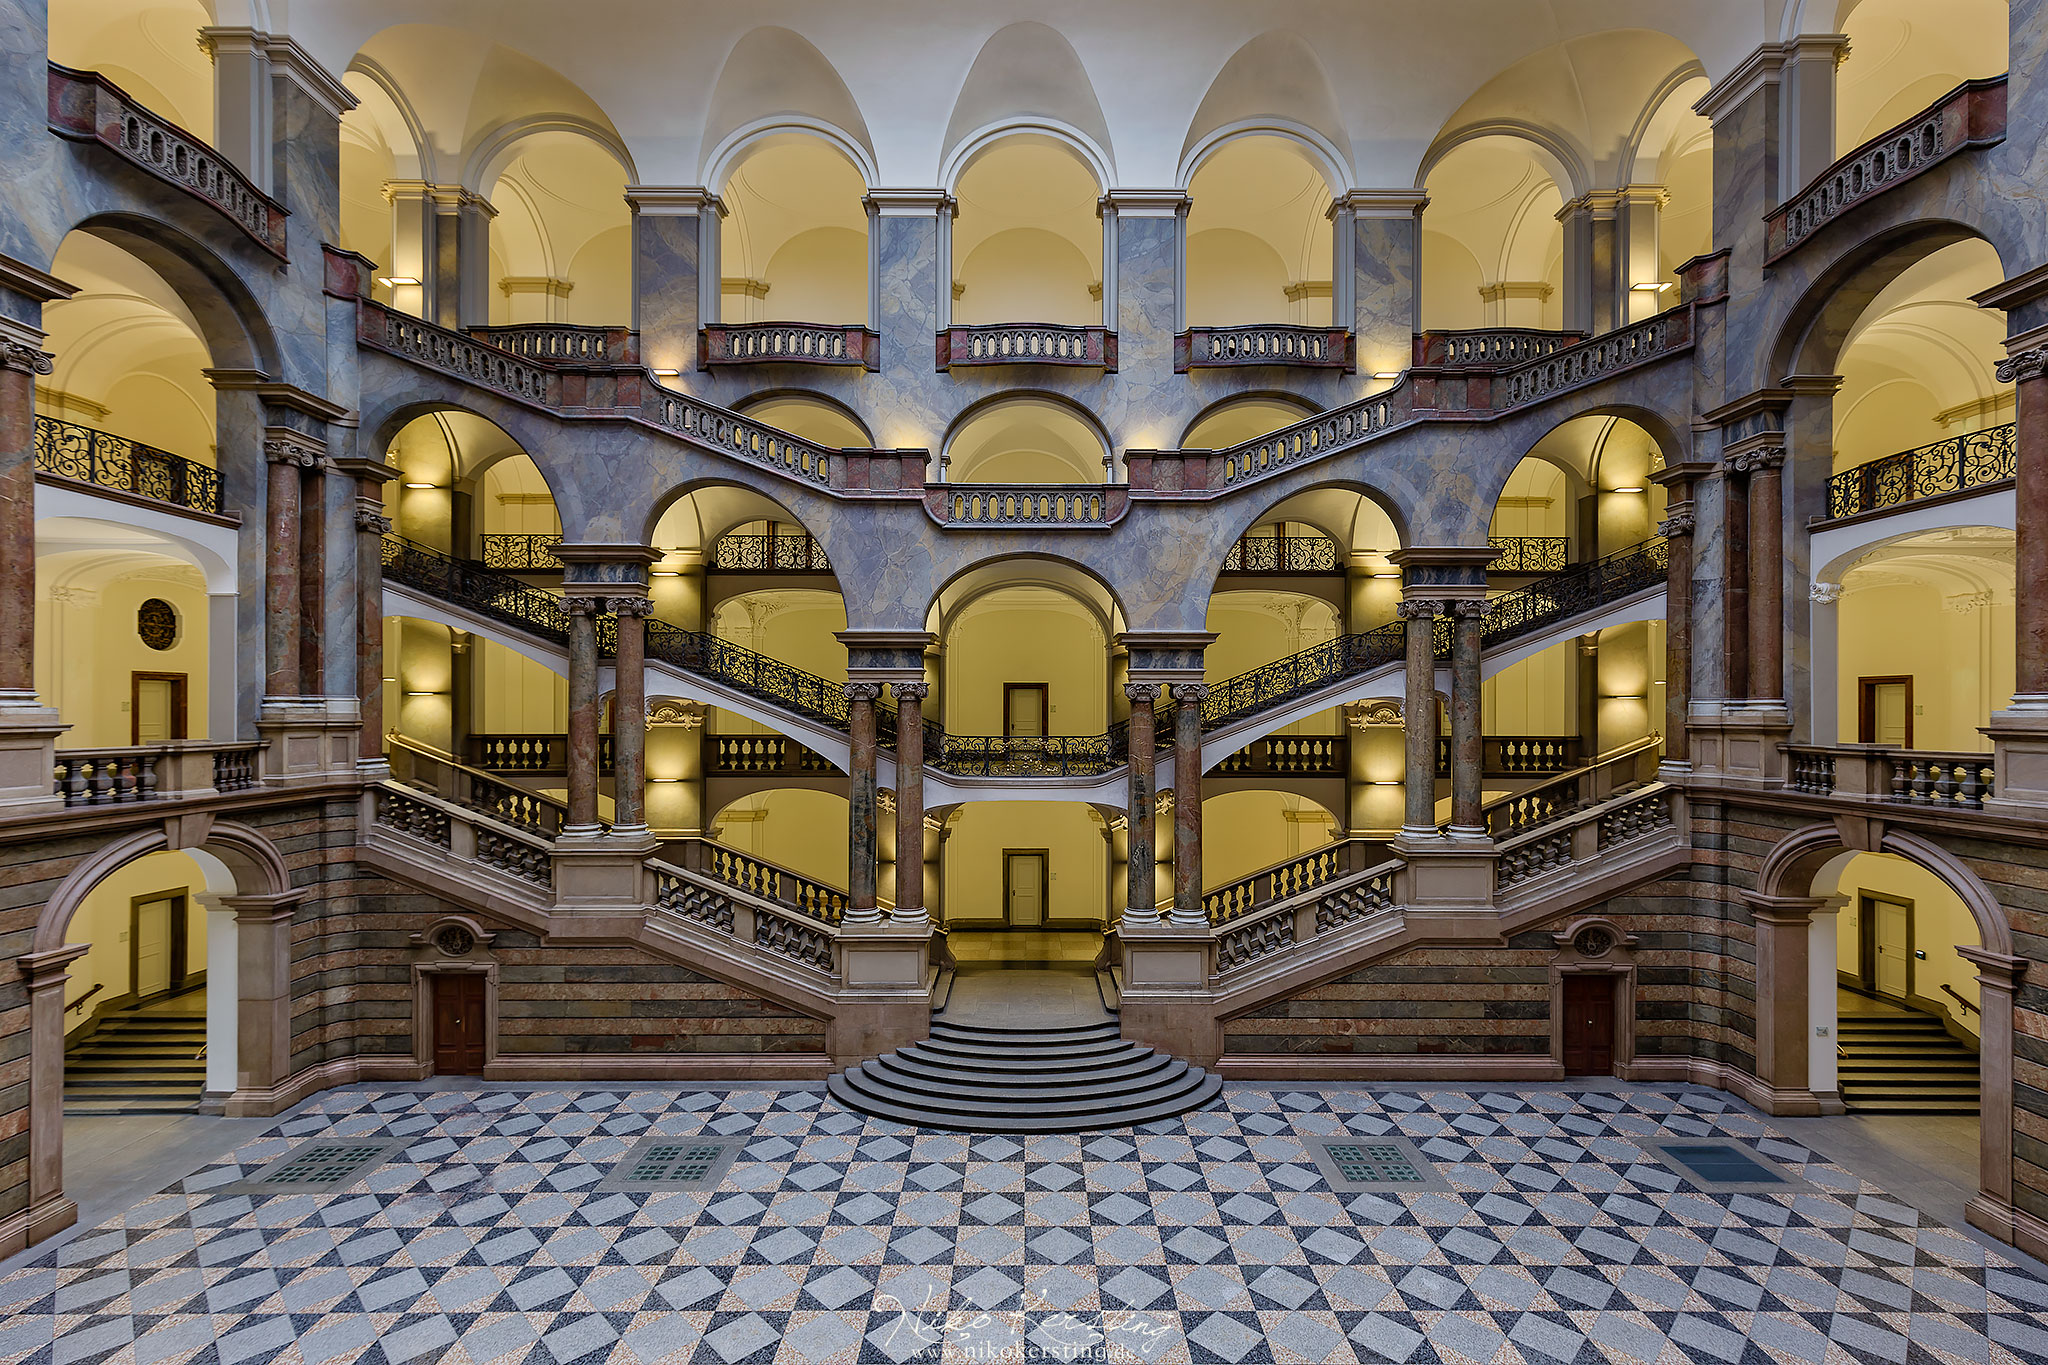 Justizpalast, Germany